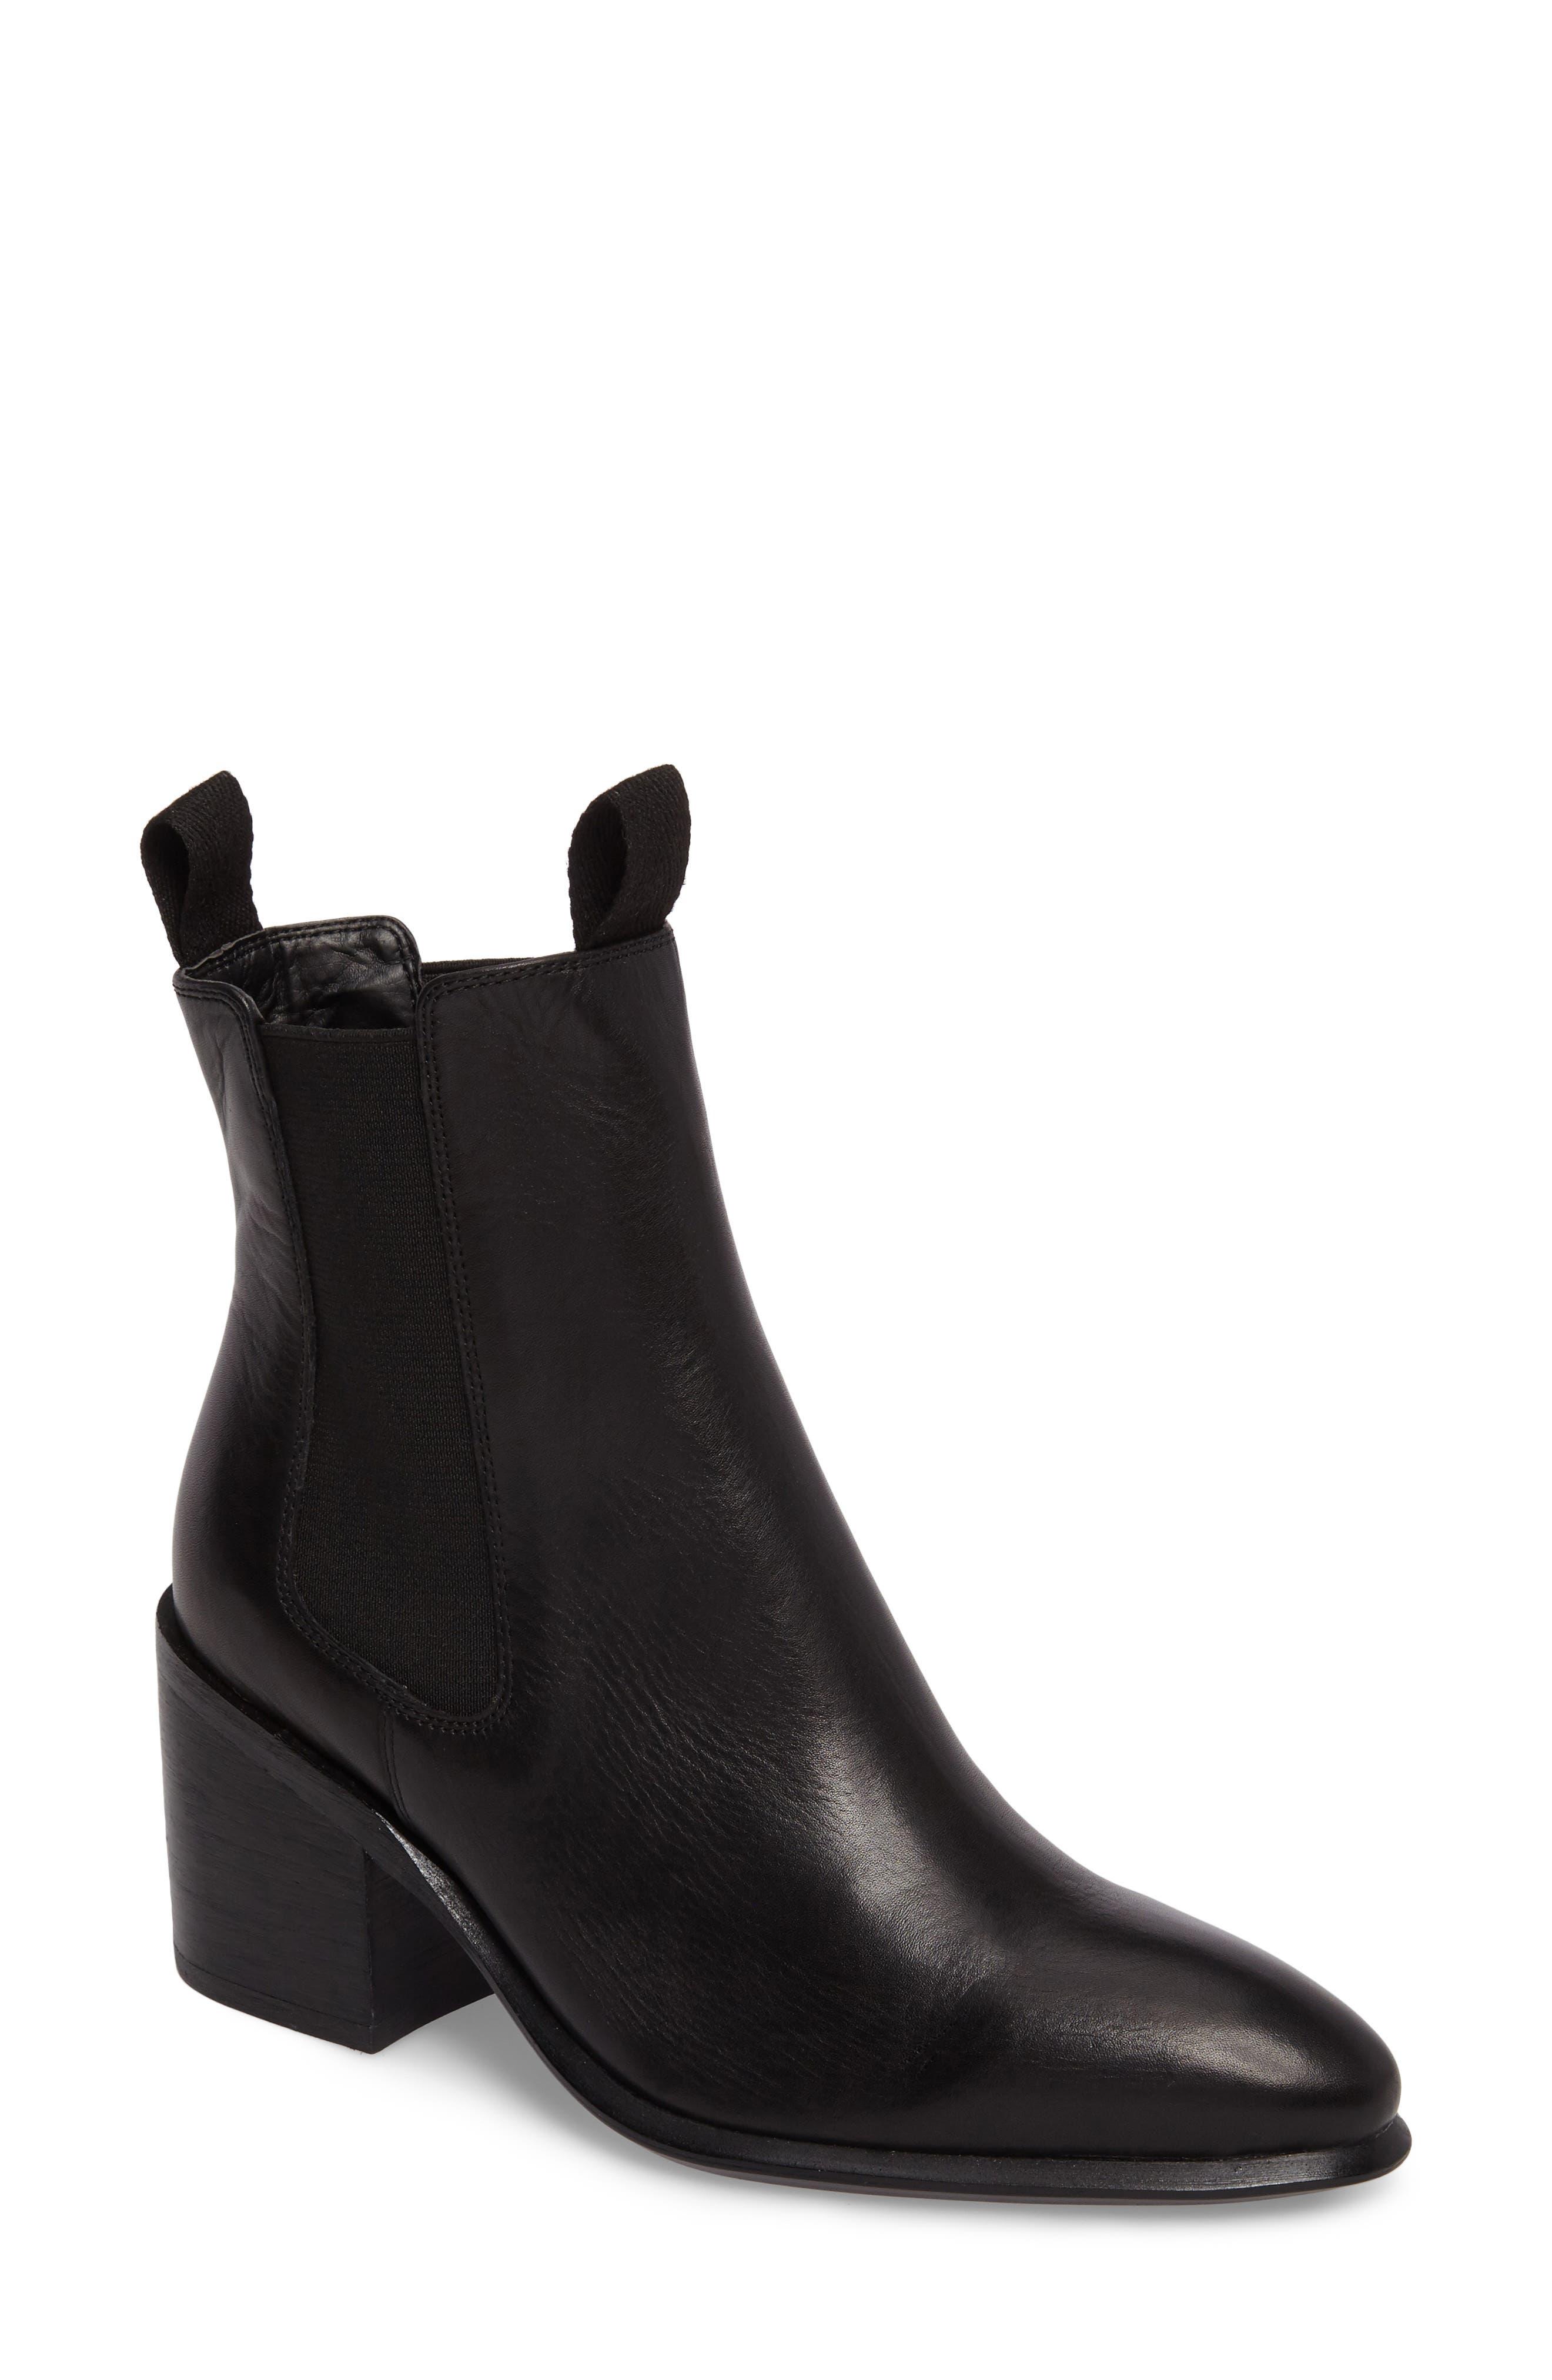 Hampton Bootie,                         Main,                         color, Black Leather